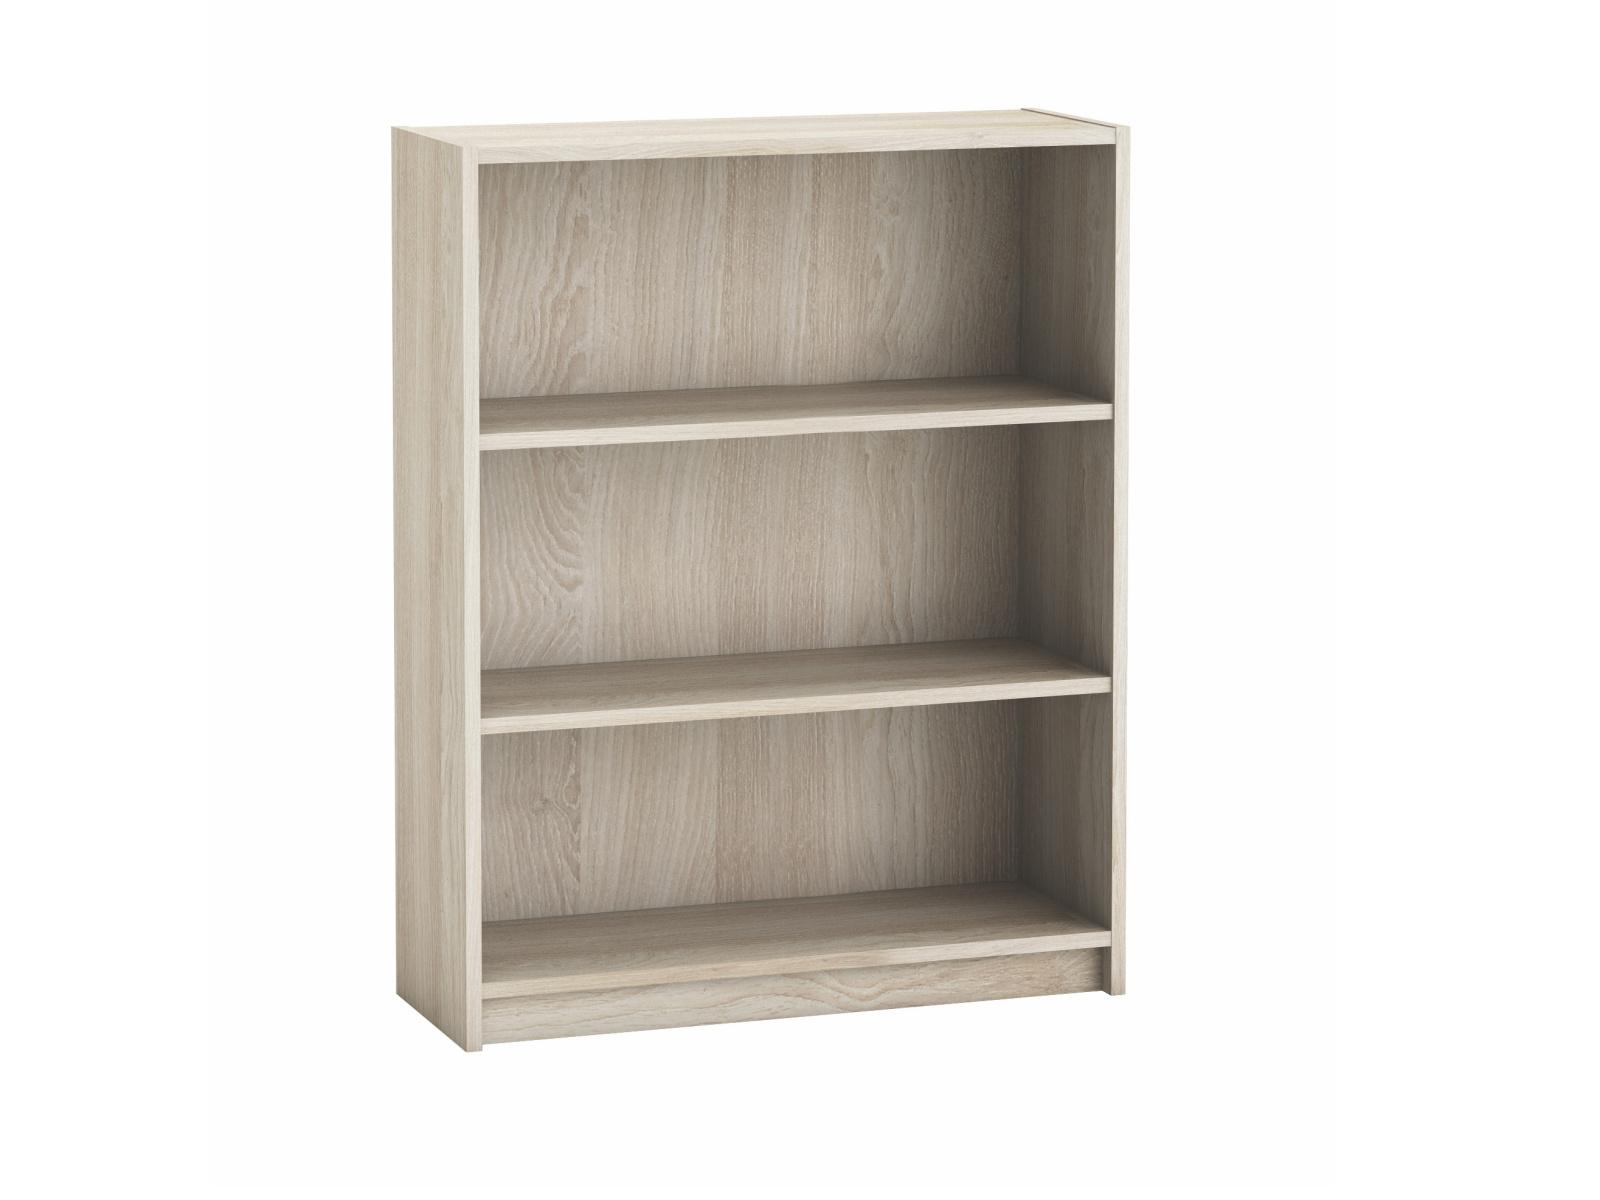 OPTIMA, knihovna šíře 80 cm, dub shannon, knihovna šíře 80 cm, dub shannon